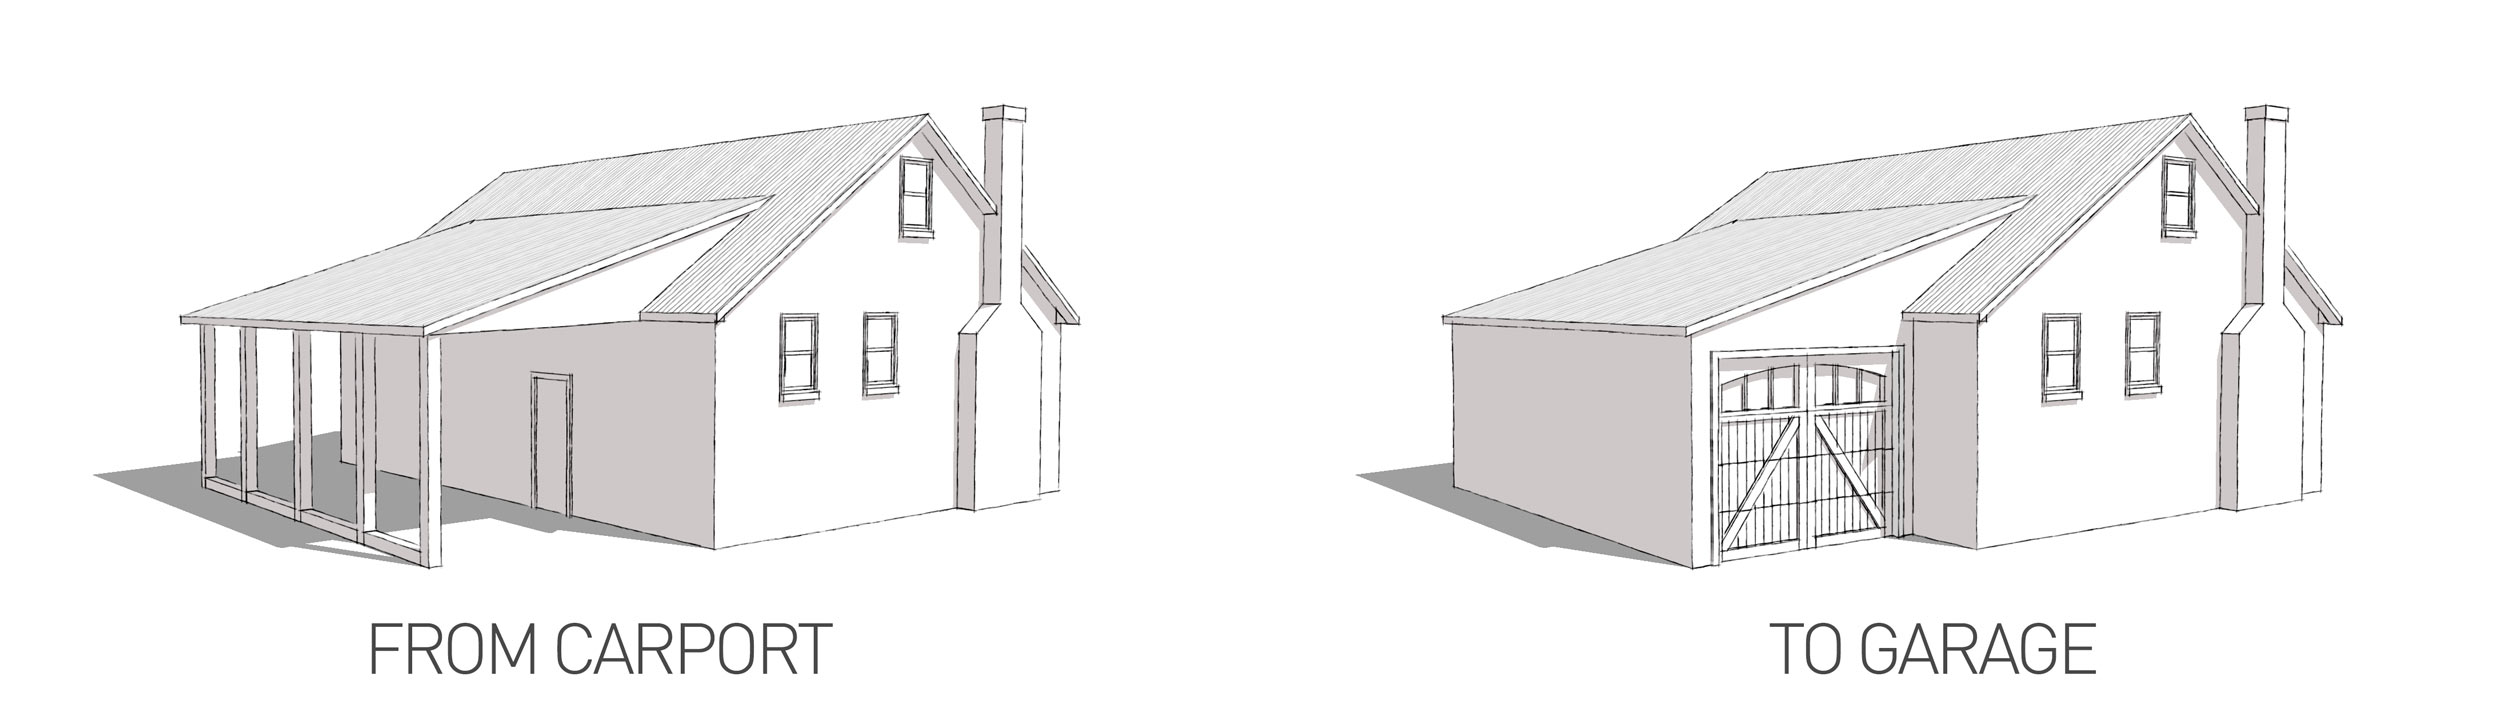 vancouver-carport-to-garage-conversion